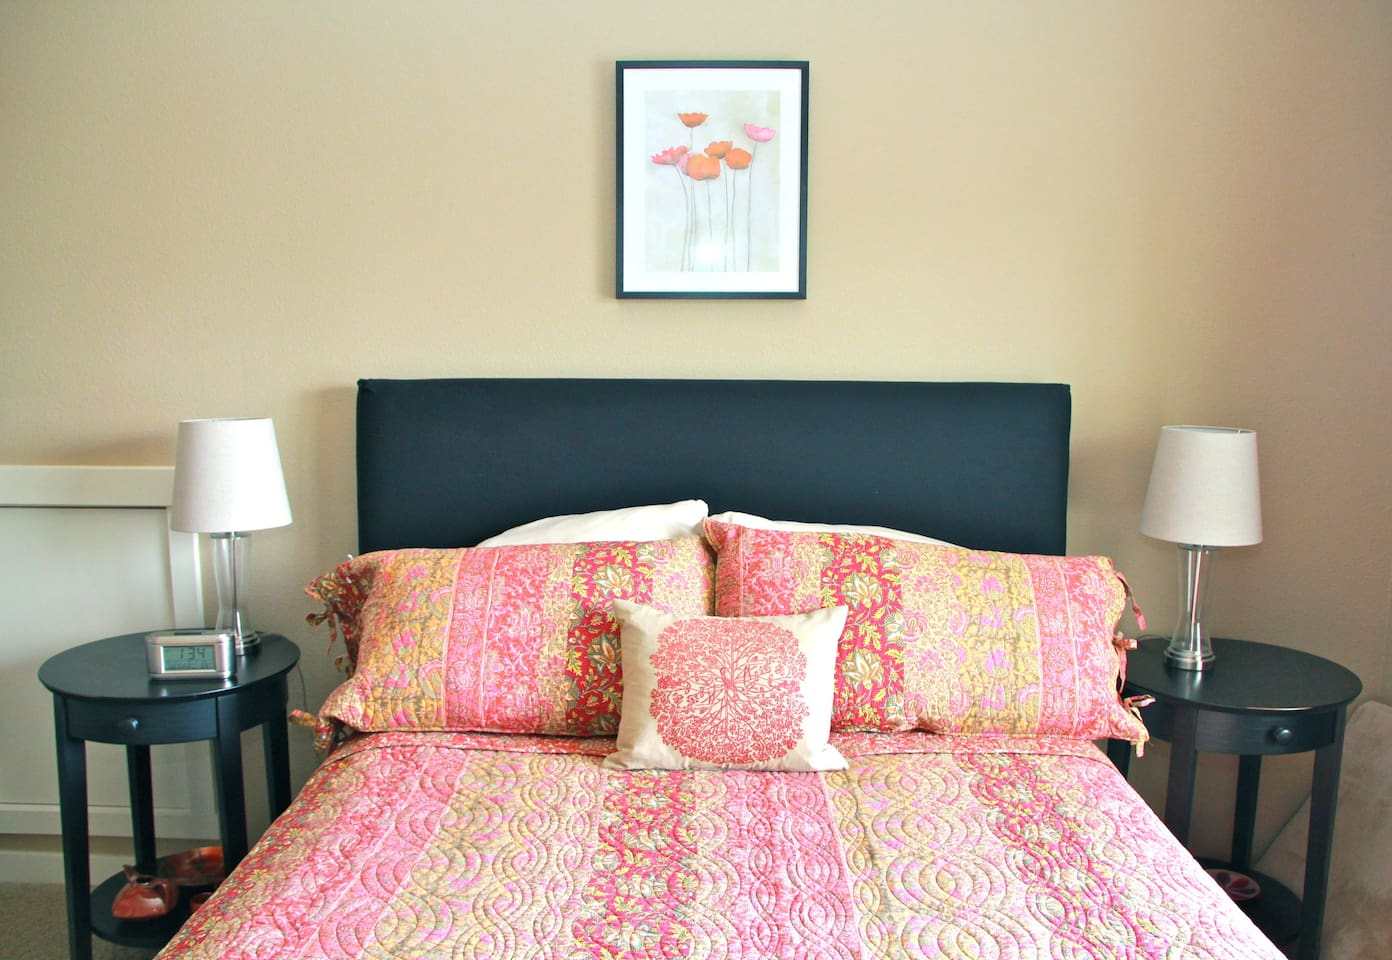 Welcoming, restful sleep in A Master Bedroom with Queen Bed.